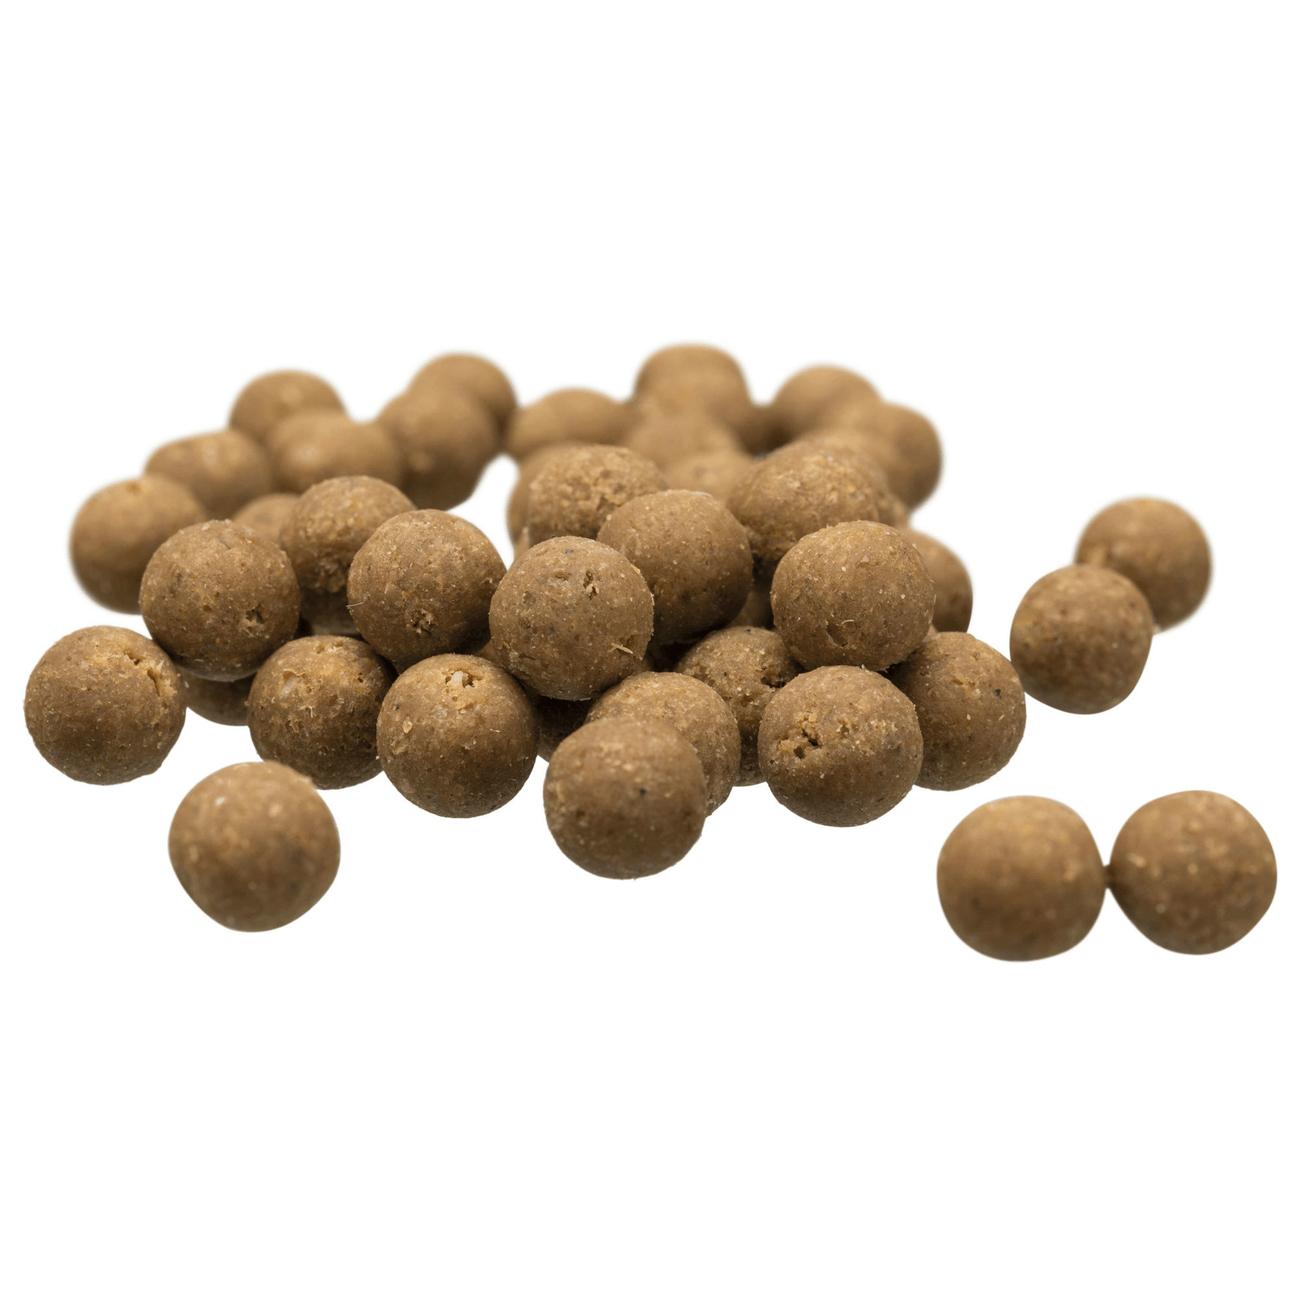 TRIXIE Premio Trainer Snack Balls 31805, Bild 2